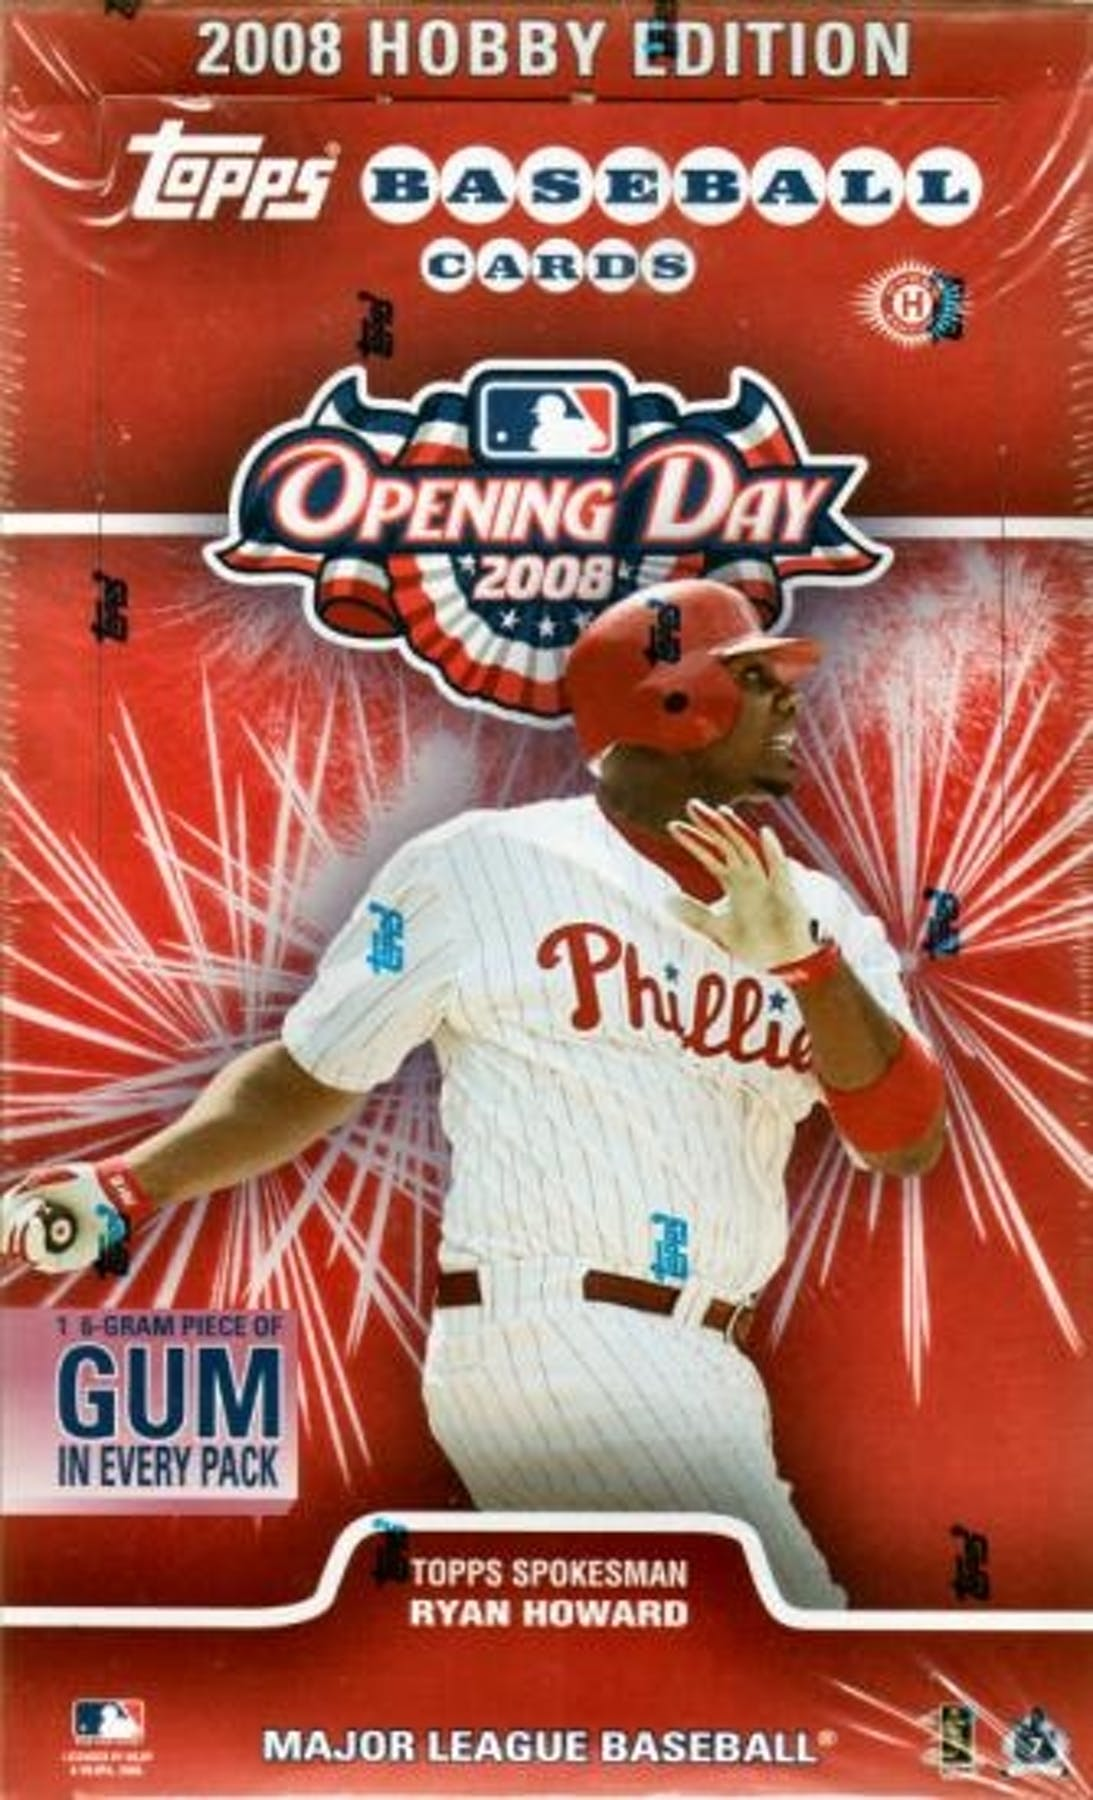 2008 Topps Opening Day Baseball Hobby Box Da Card World